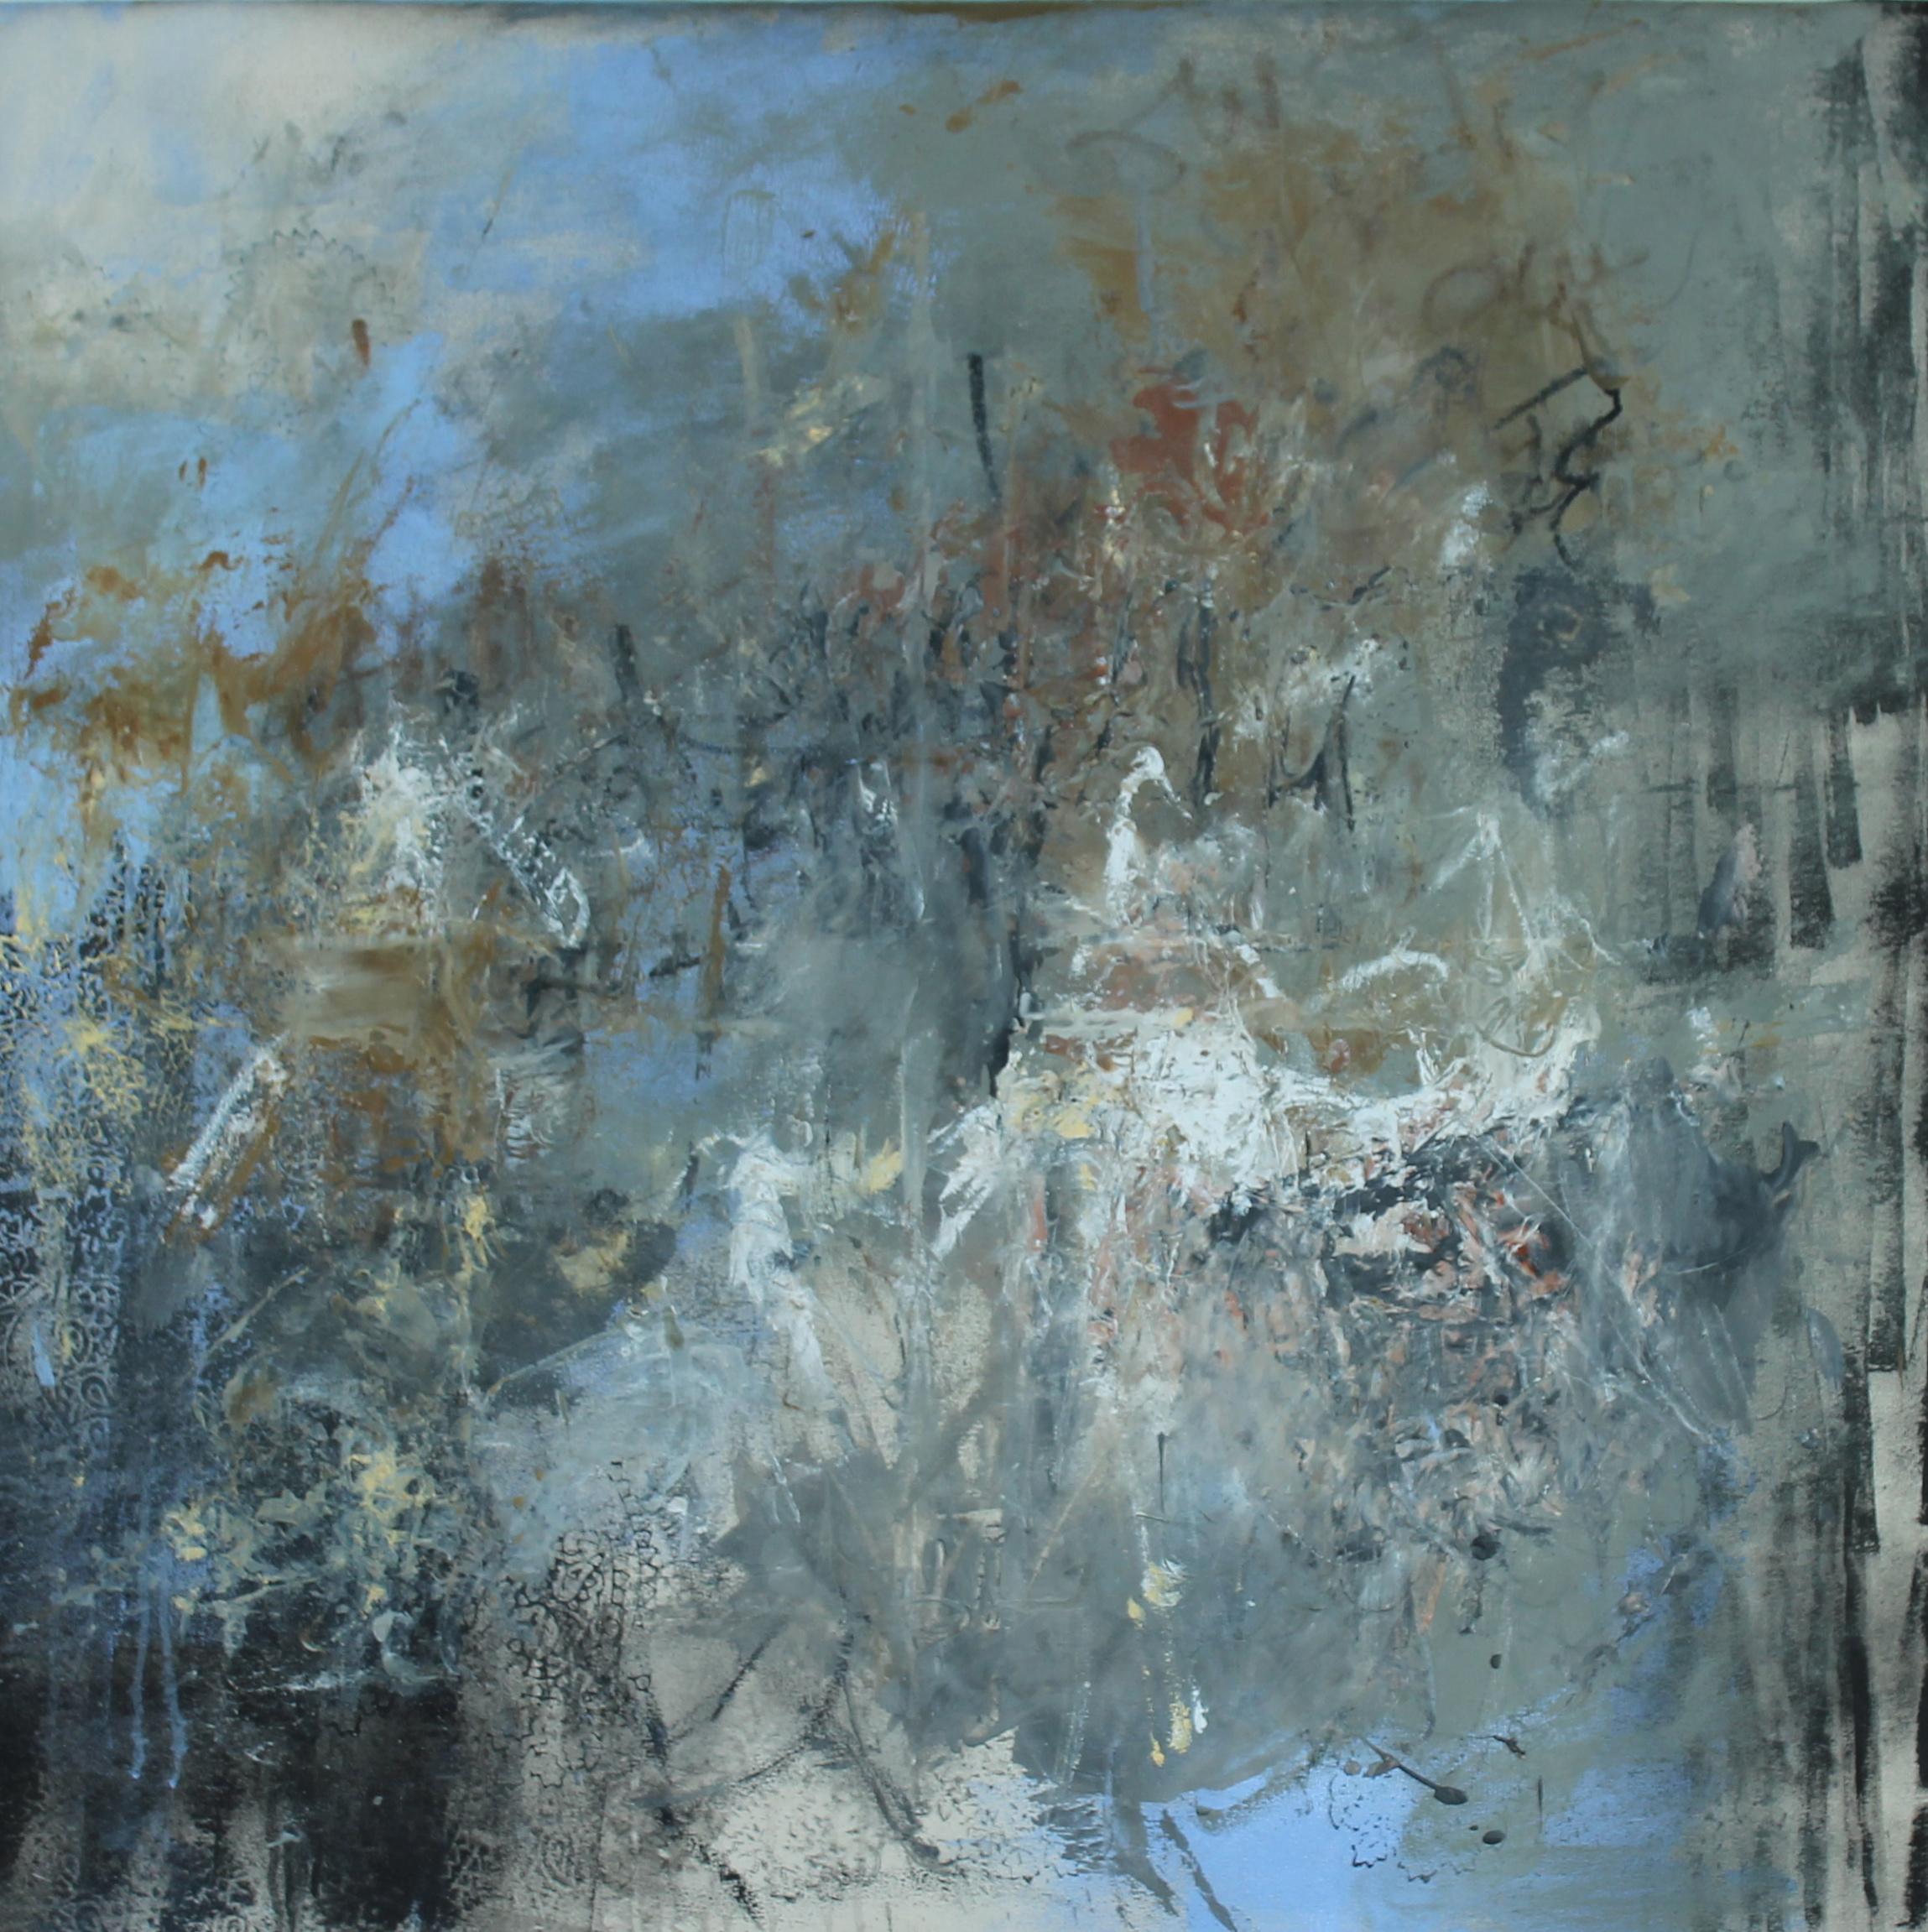 """Trans-subjectivity 2"" 122 x 122cm Encaustic oil and acrylic on canvas."